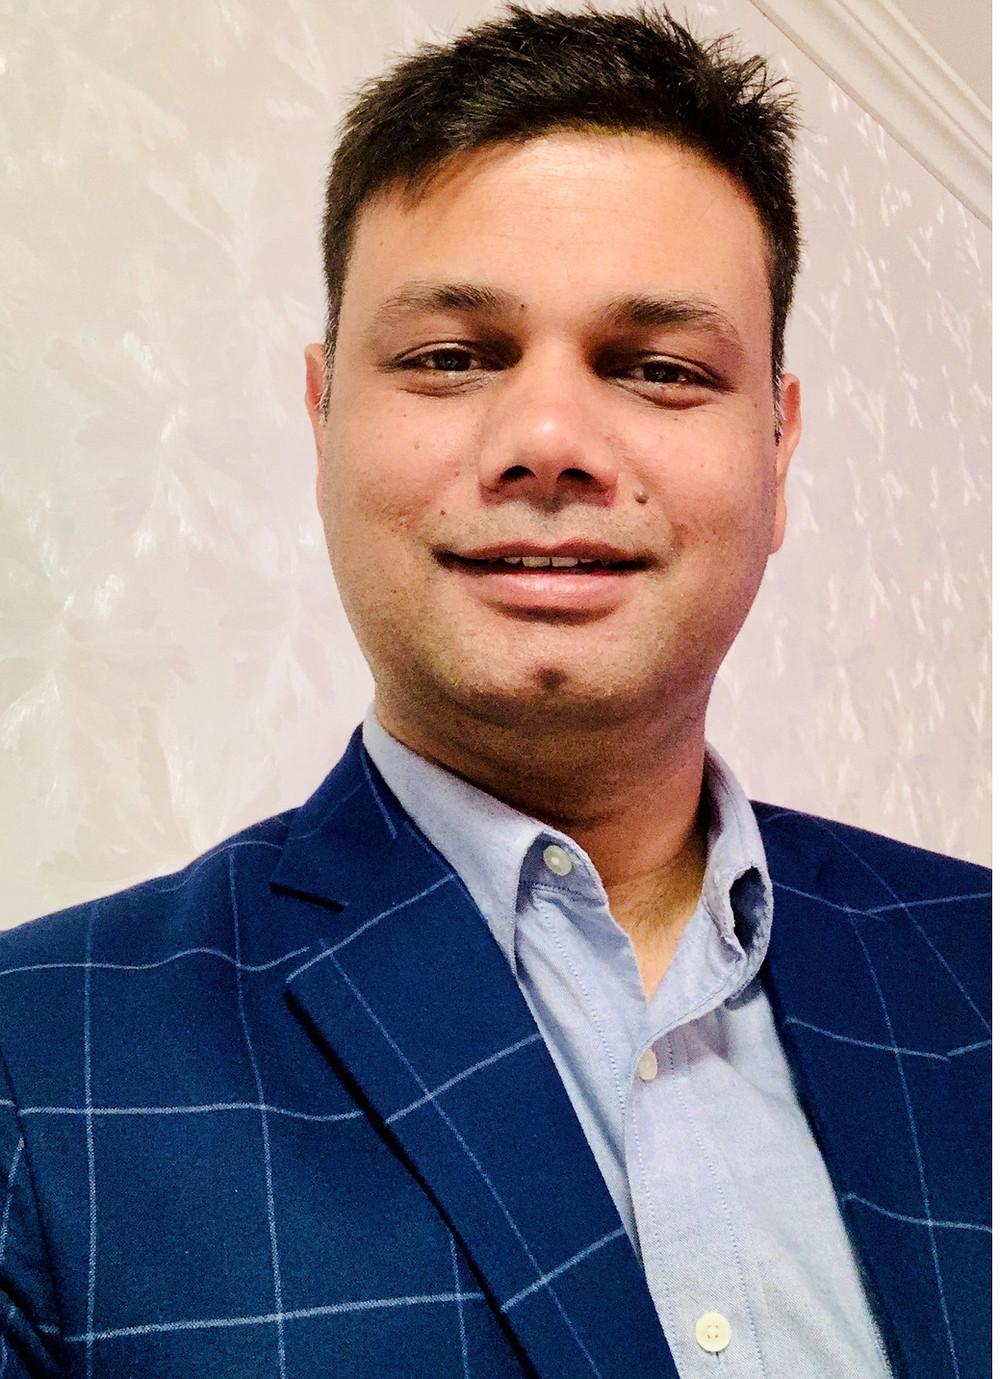 Abhishek Ramavat, General Manager and Practice Lead EMEA